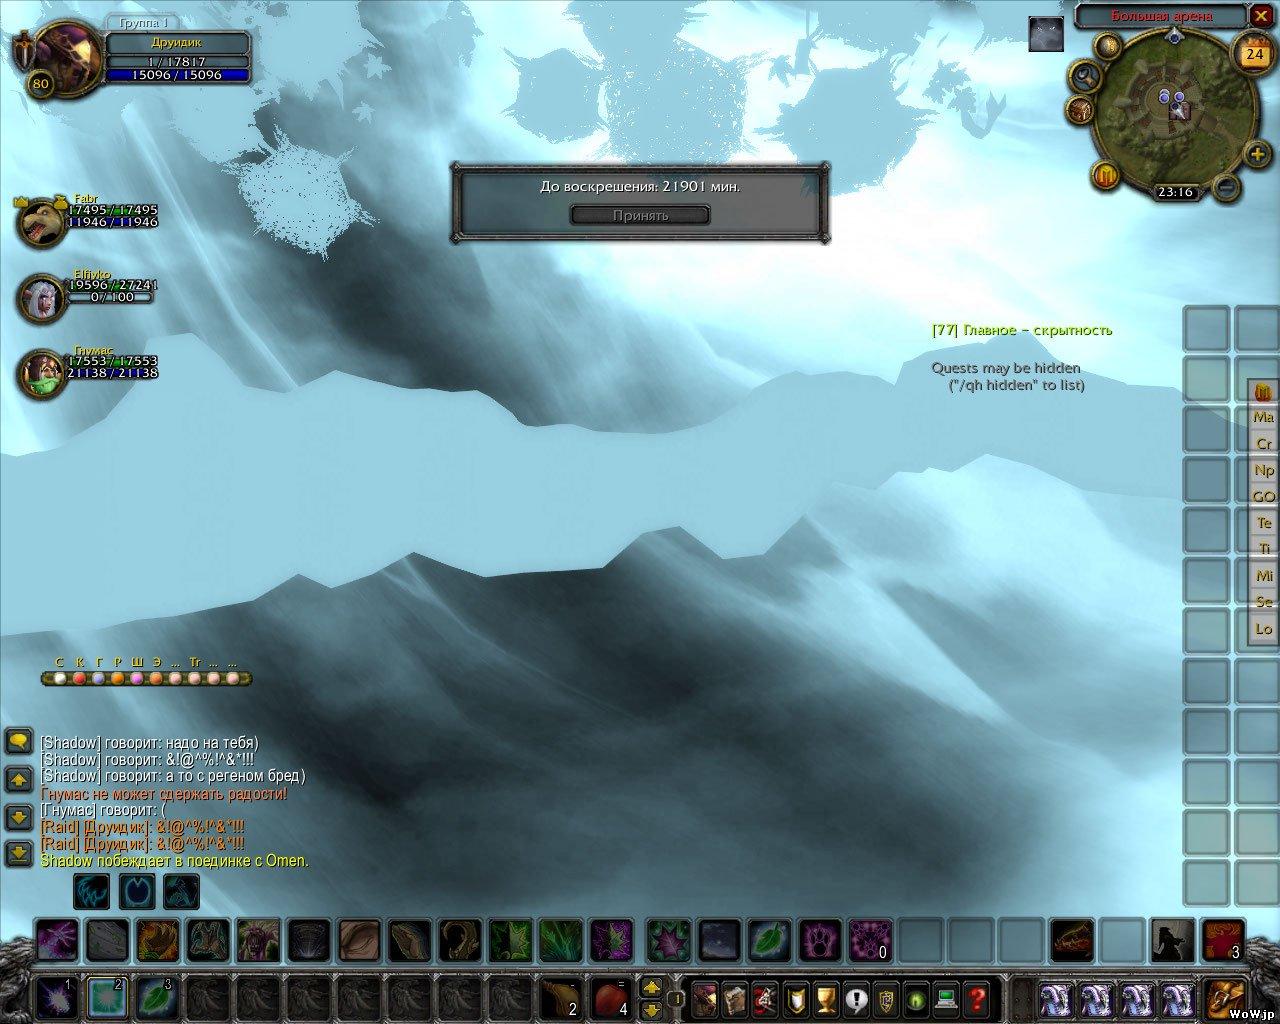 Warlords of Draenor: PvP теперь требует активации на PvE серверах